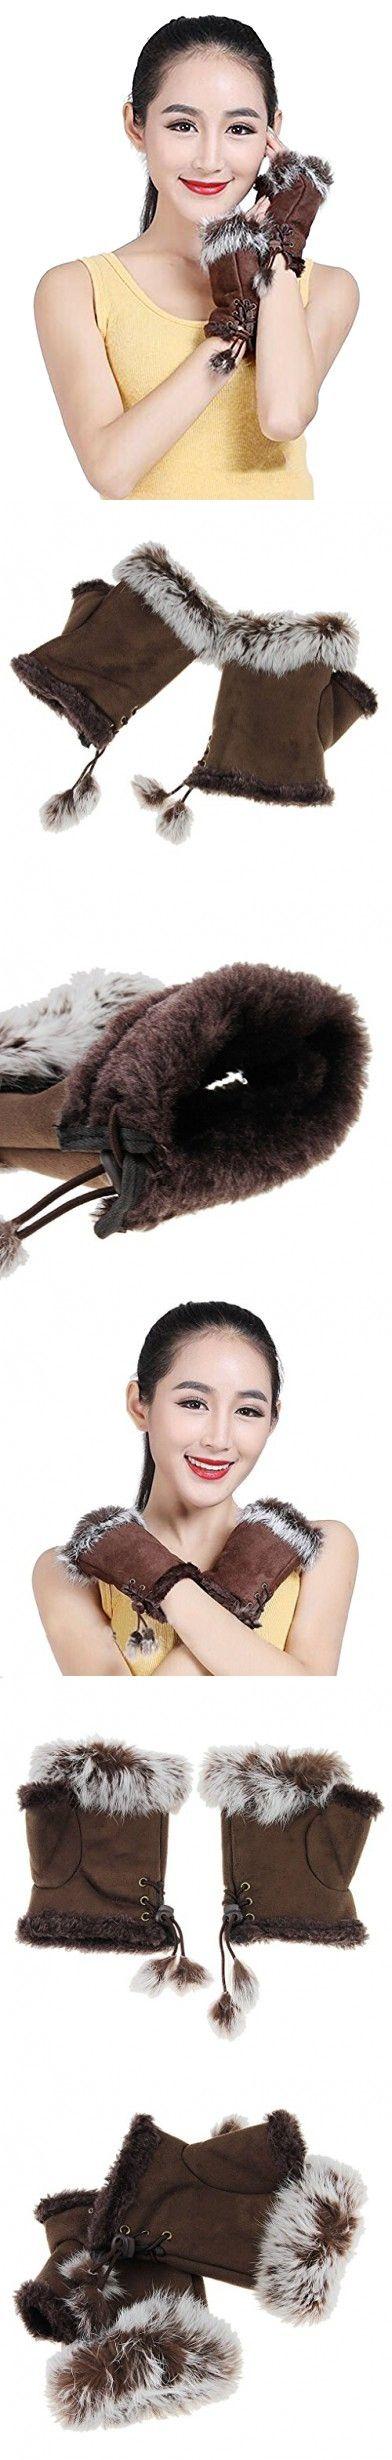 Women Girls Faux Suede Rabbit Fur Winter Warm Wrist Fingerless Gloves Mittens